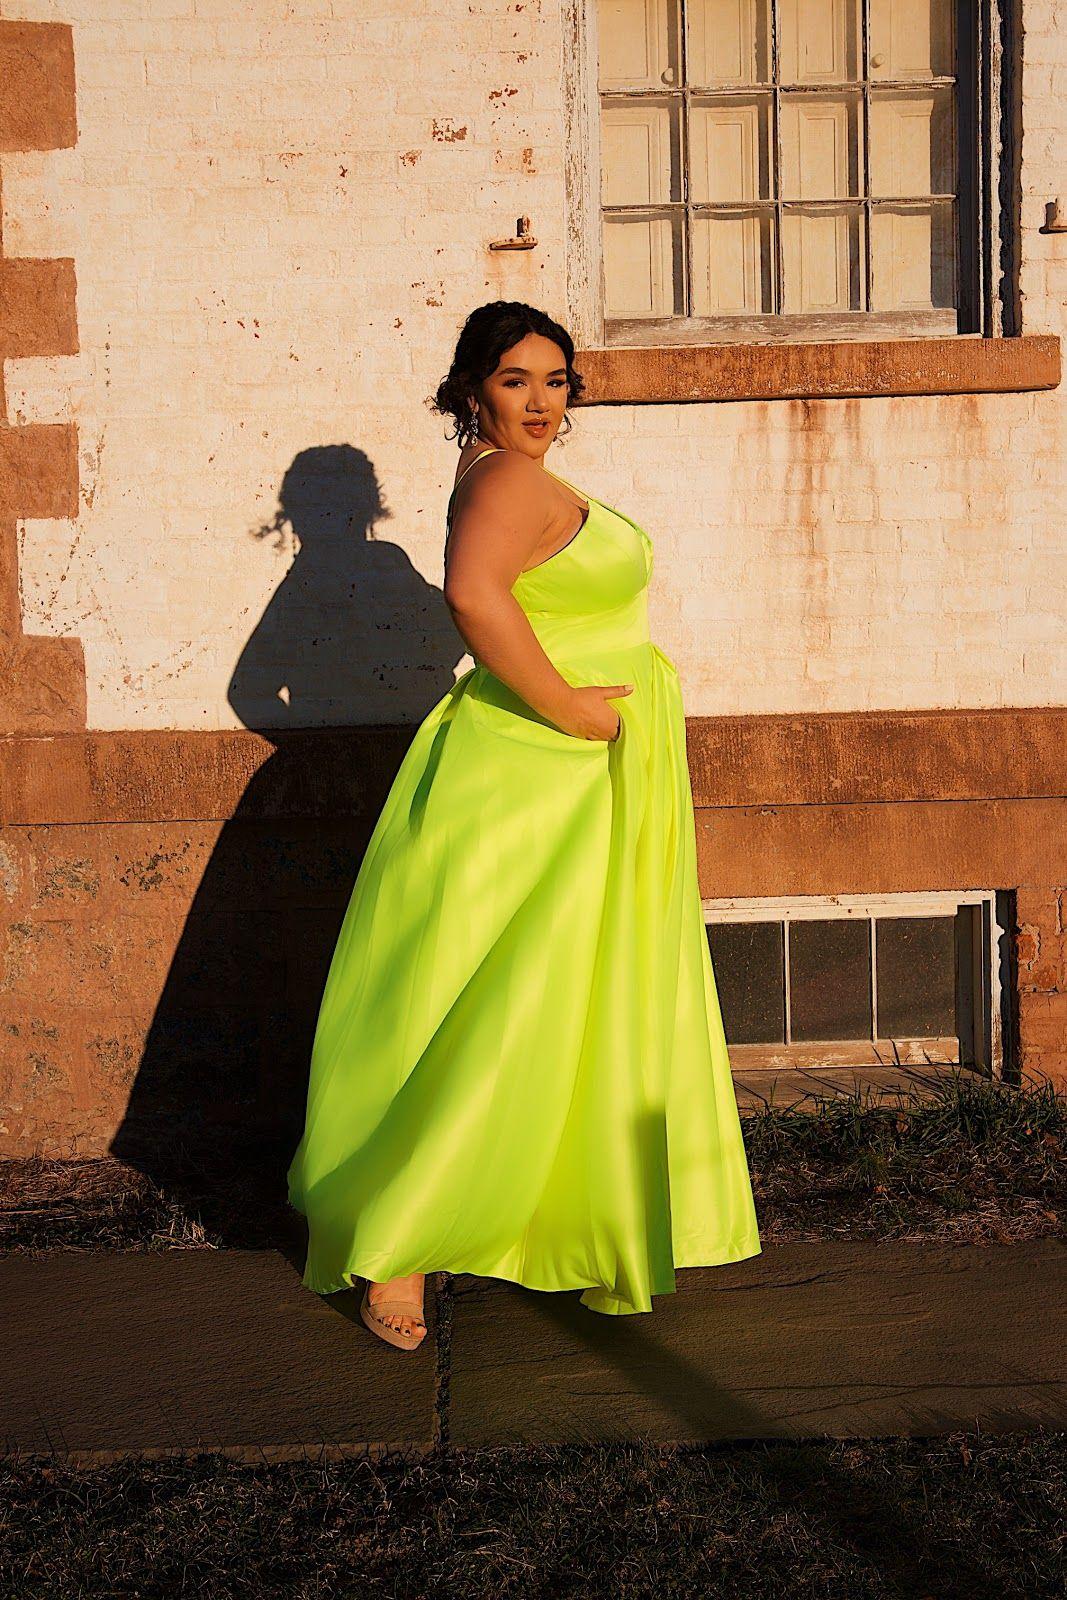 Fabulous Plus Size Prom Dress Neon Prom Dresses Plus Size Prom Dresses Plus Size Prom [ 1600 x 1067 Pixel ]